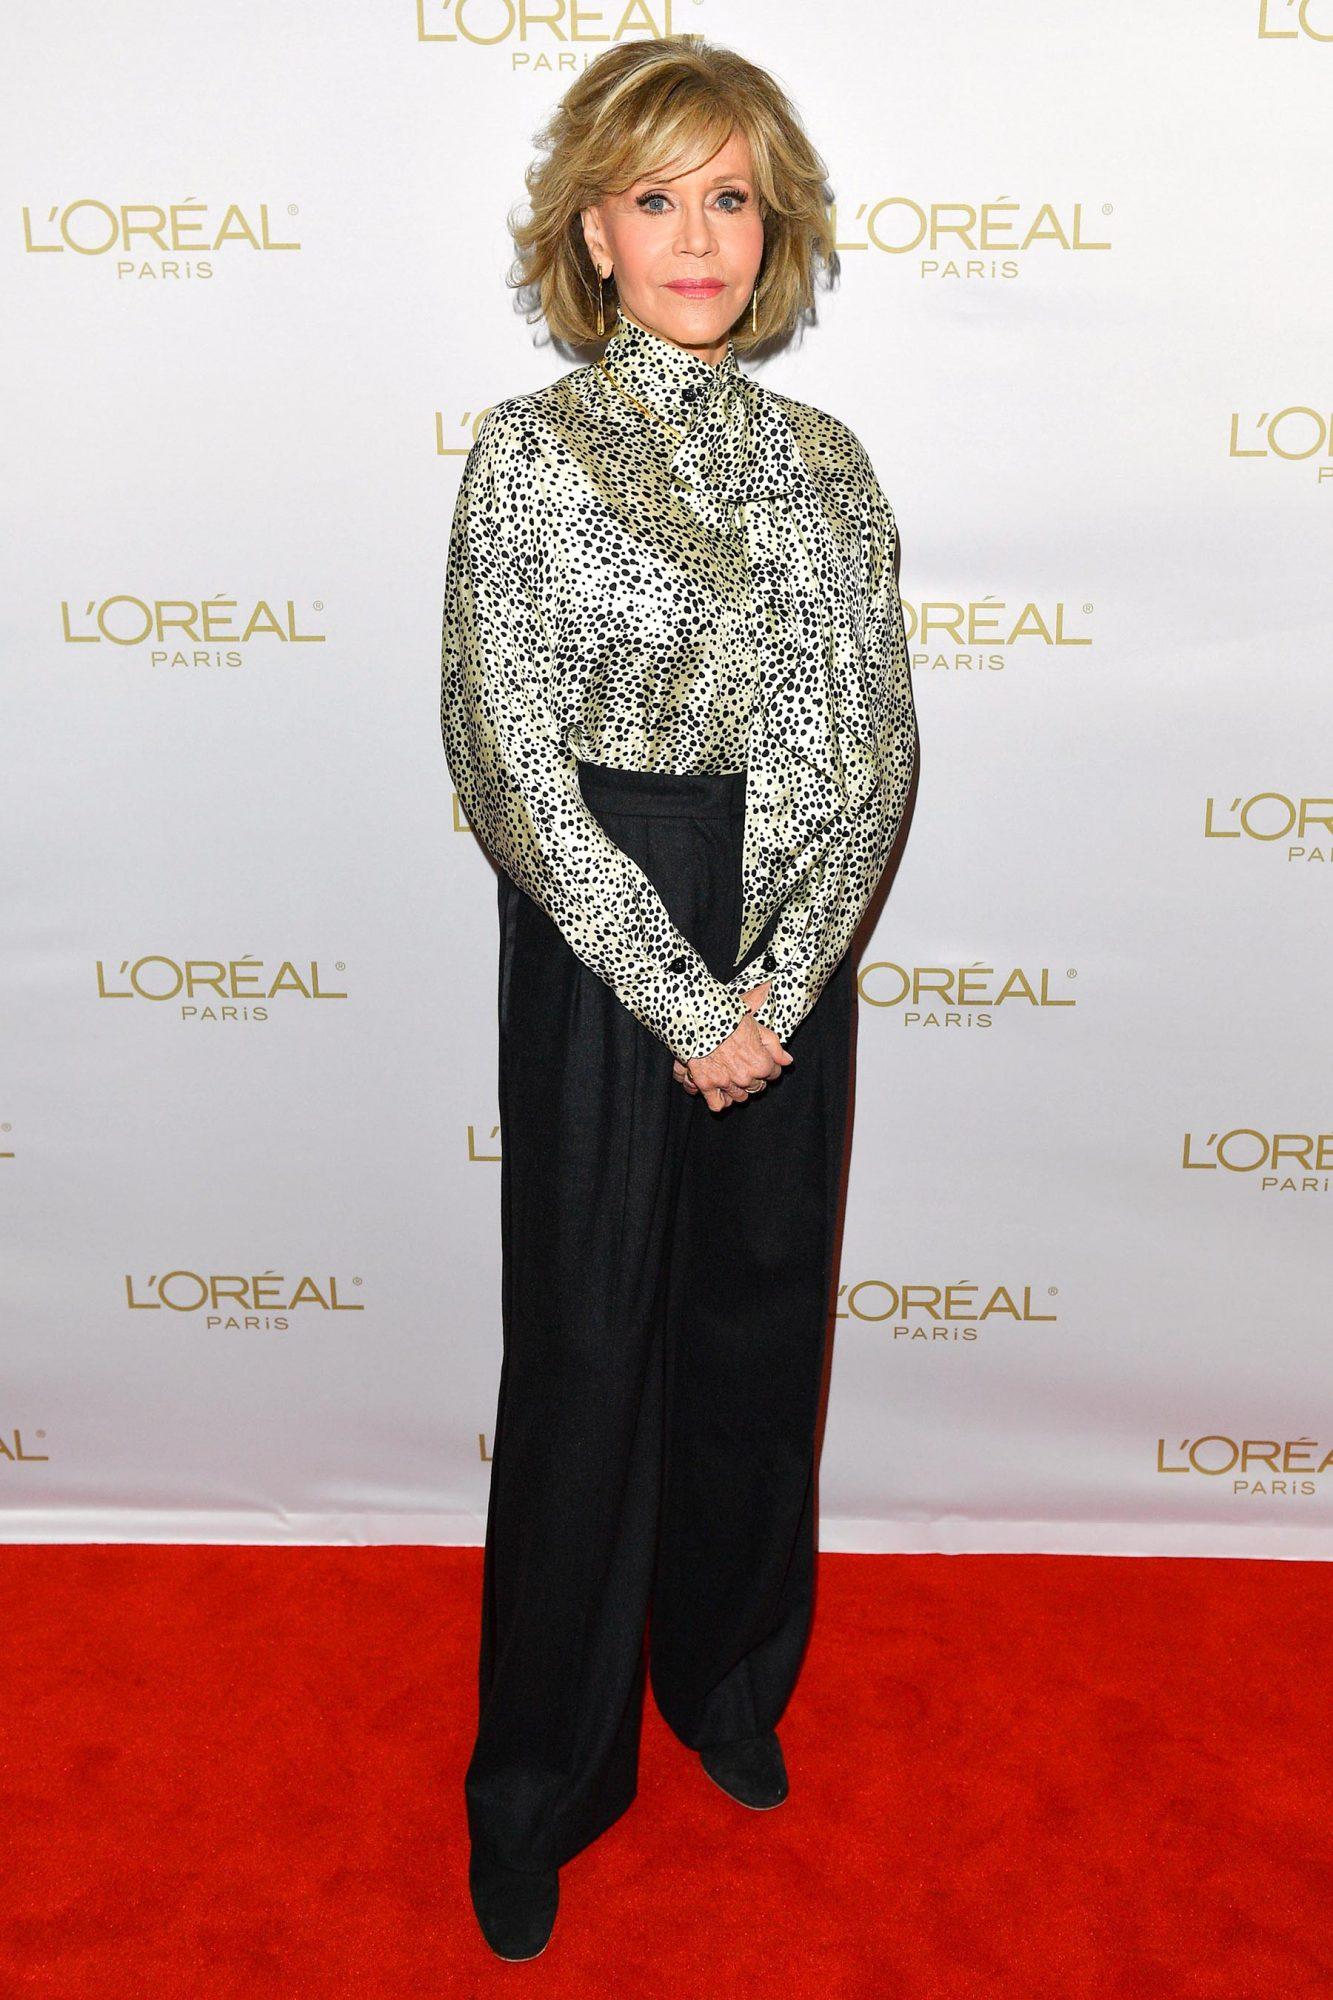 L'Oréal Presents In Conversation with Jane Fonda During 2019 Toronto International Film Festival